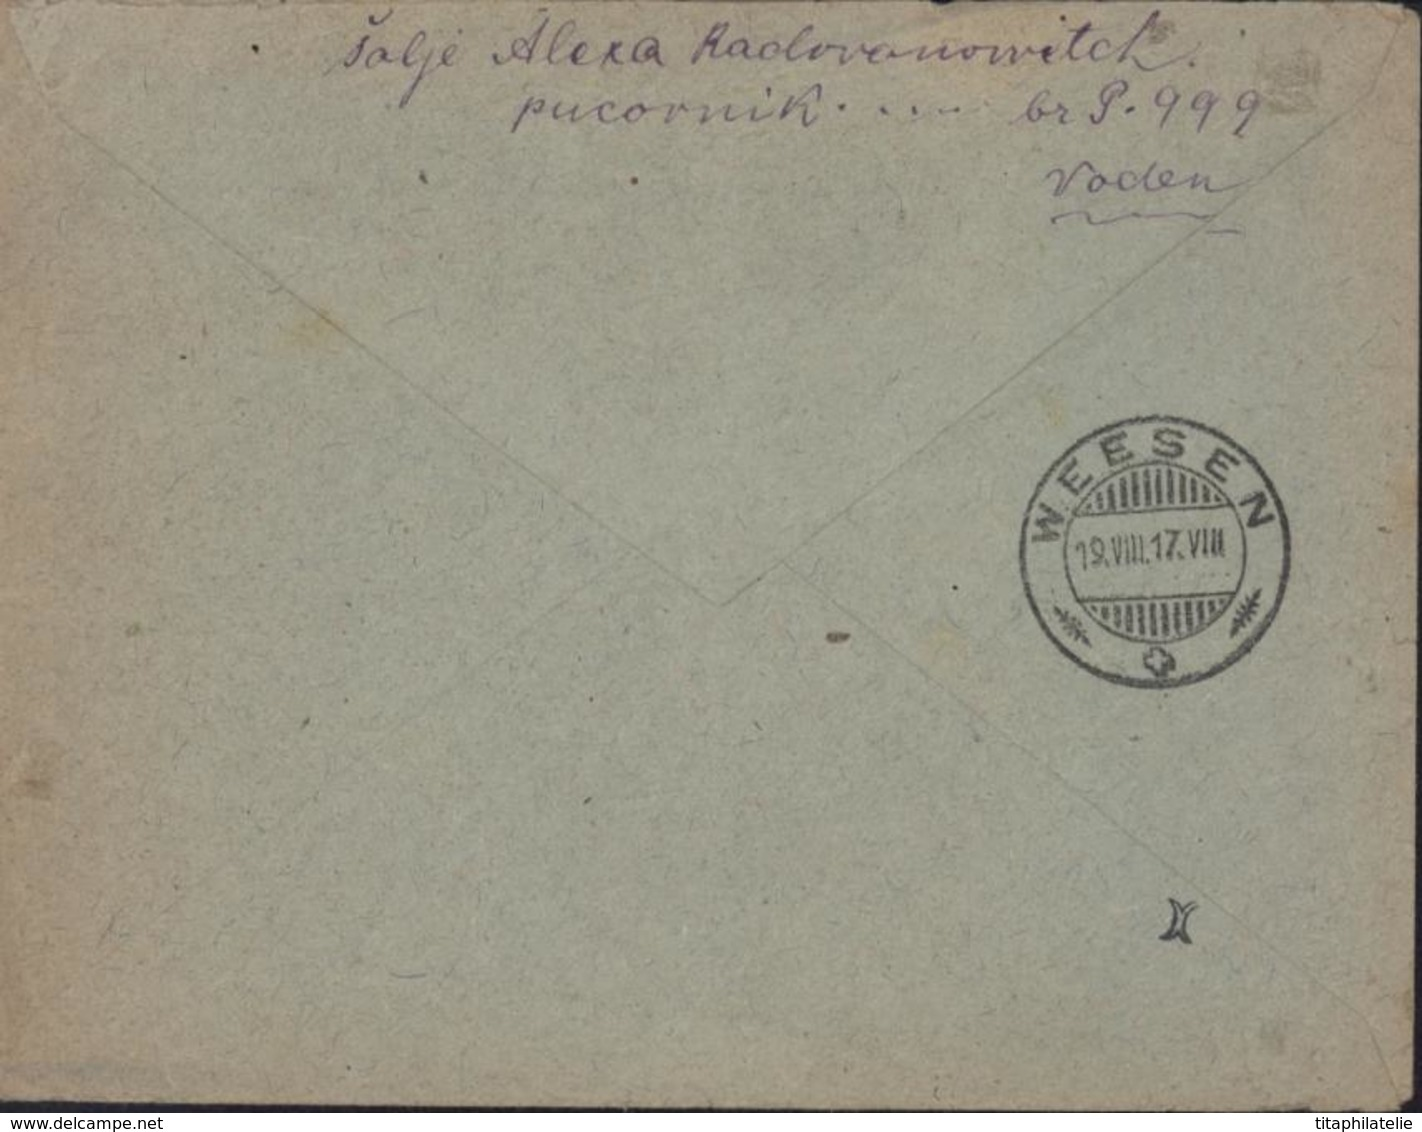 Guerre 14 18 Poste Serbie YT 140 X2 CAD Trésor Et Postes 504 3 8 17 Recommandée CAD Serbe SP96 16 7 17 Censure - Poststempel (Briefe)